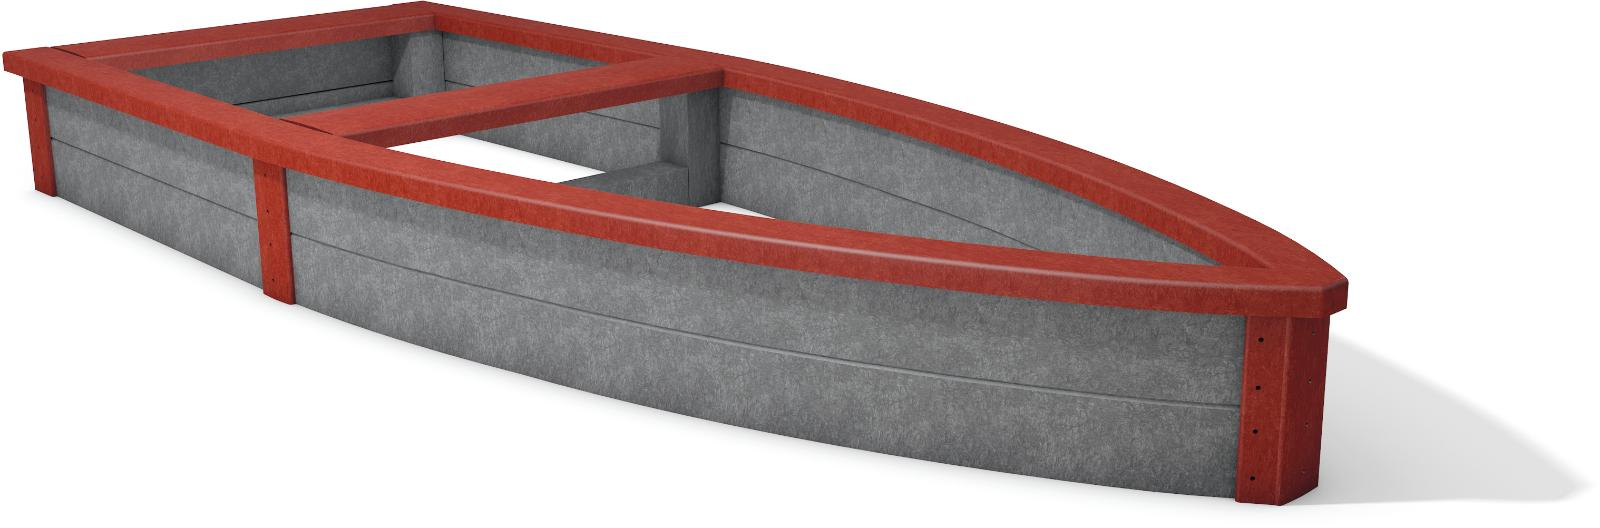 Sandkasten Lut als Boot langlebiger Recycling Kunststoff   AMSDirekt